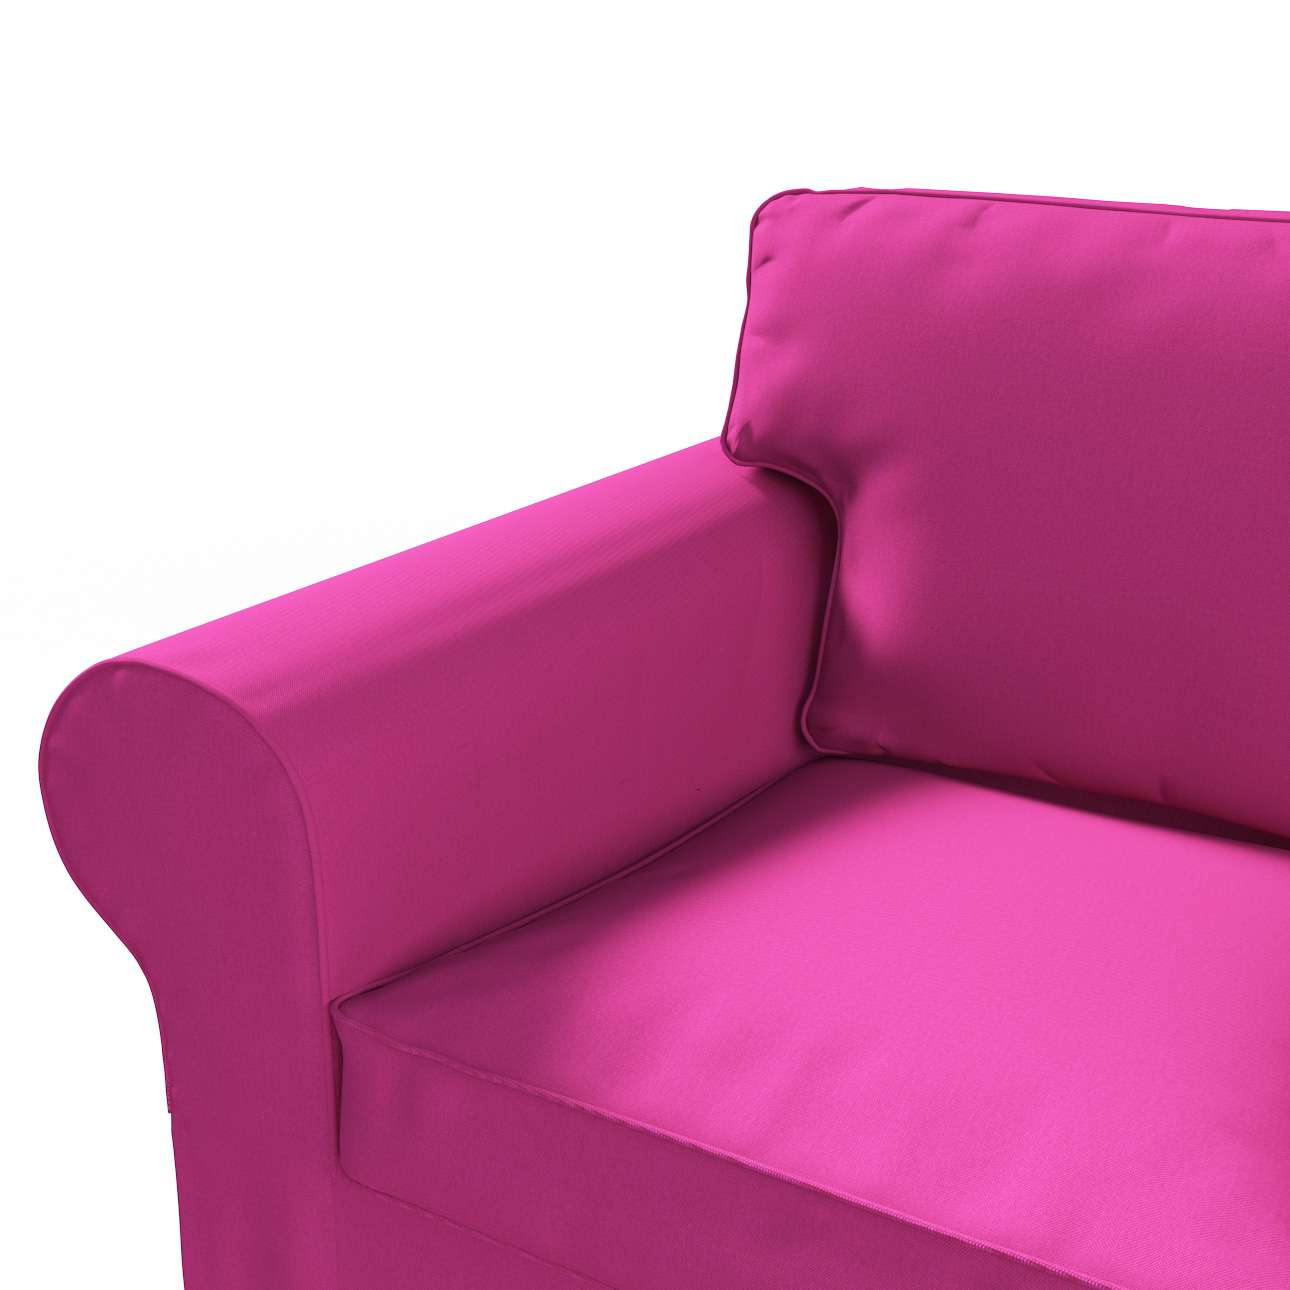 Ektorp 2-Sitzer Schlafsofabezug  ALTES Modell Sofabezug Ektorp 2-Sitzer Schlafsofa altes Modell von der Kollektion Etna, Stoff: 705-23